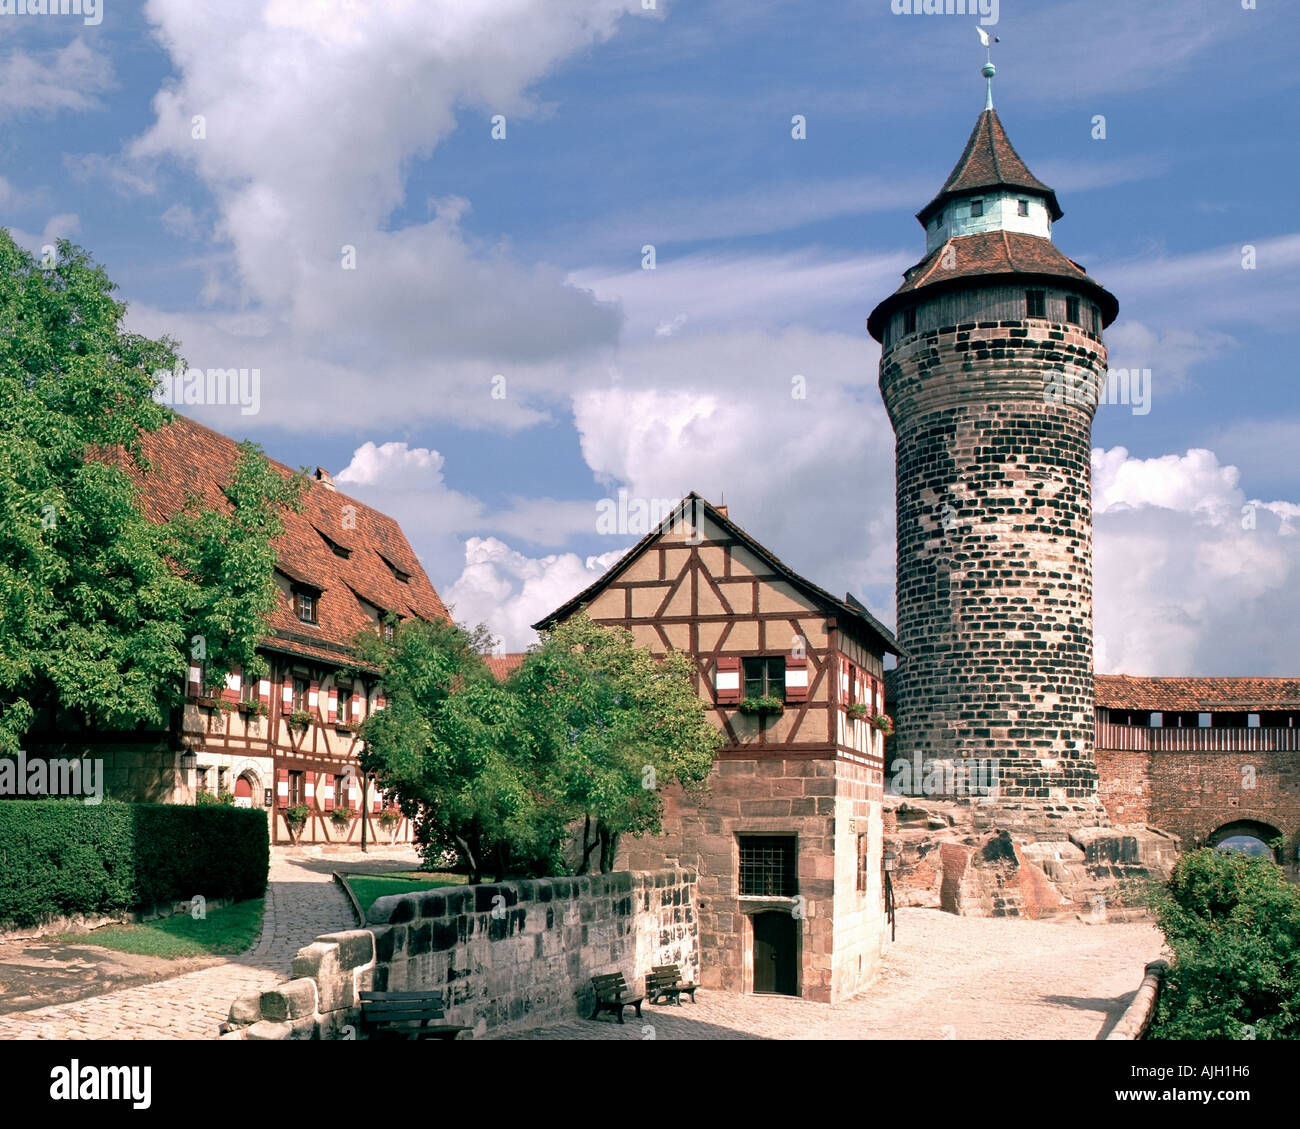 DE - Bayern: Die Burg in Nürnberg Stockbild